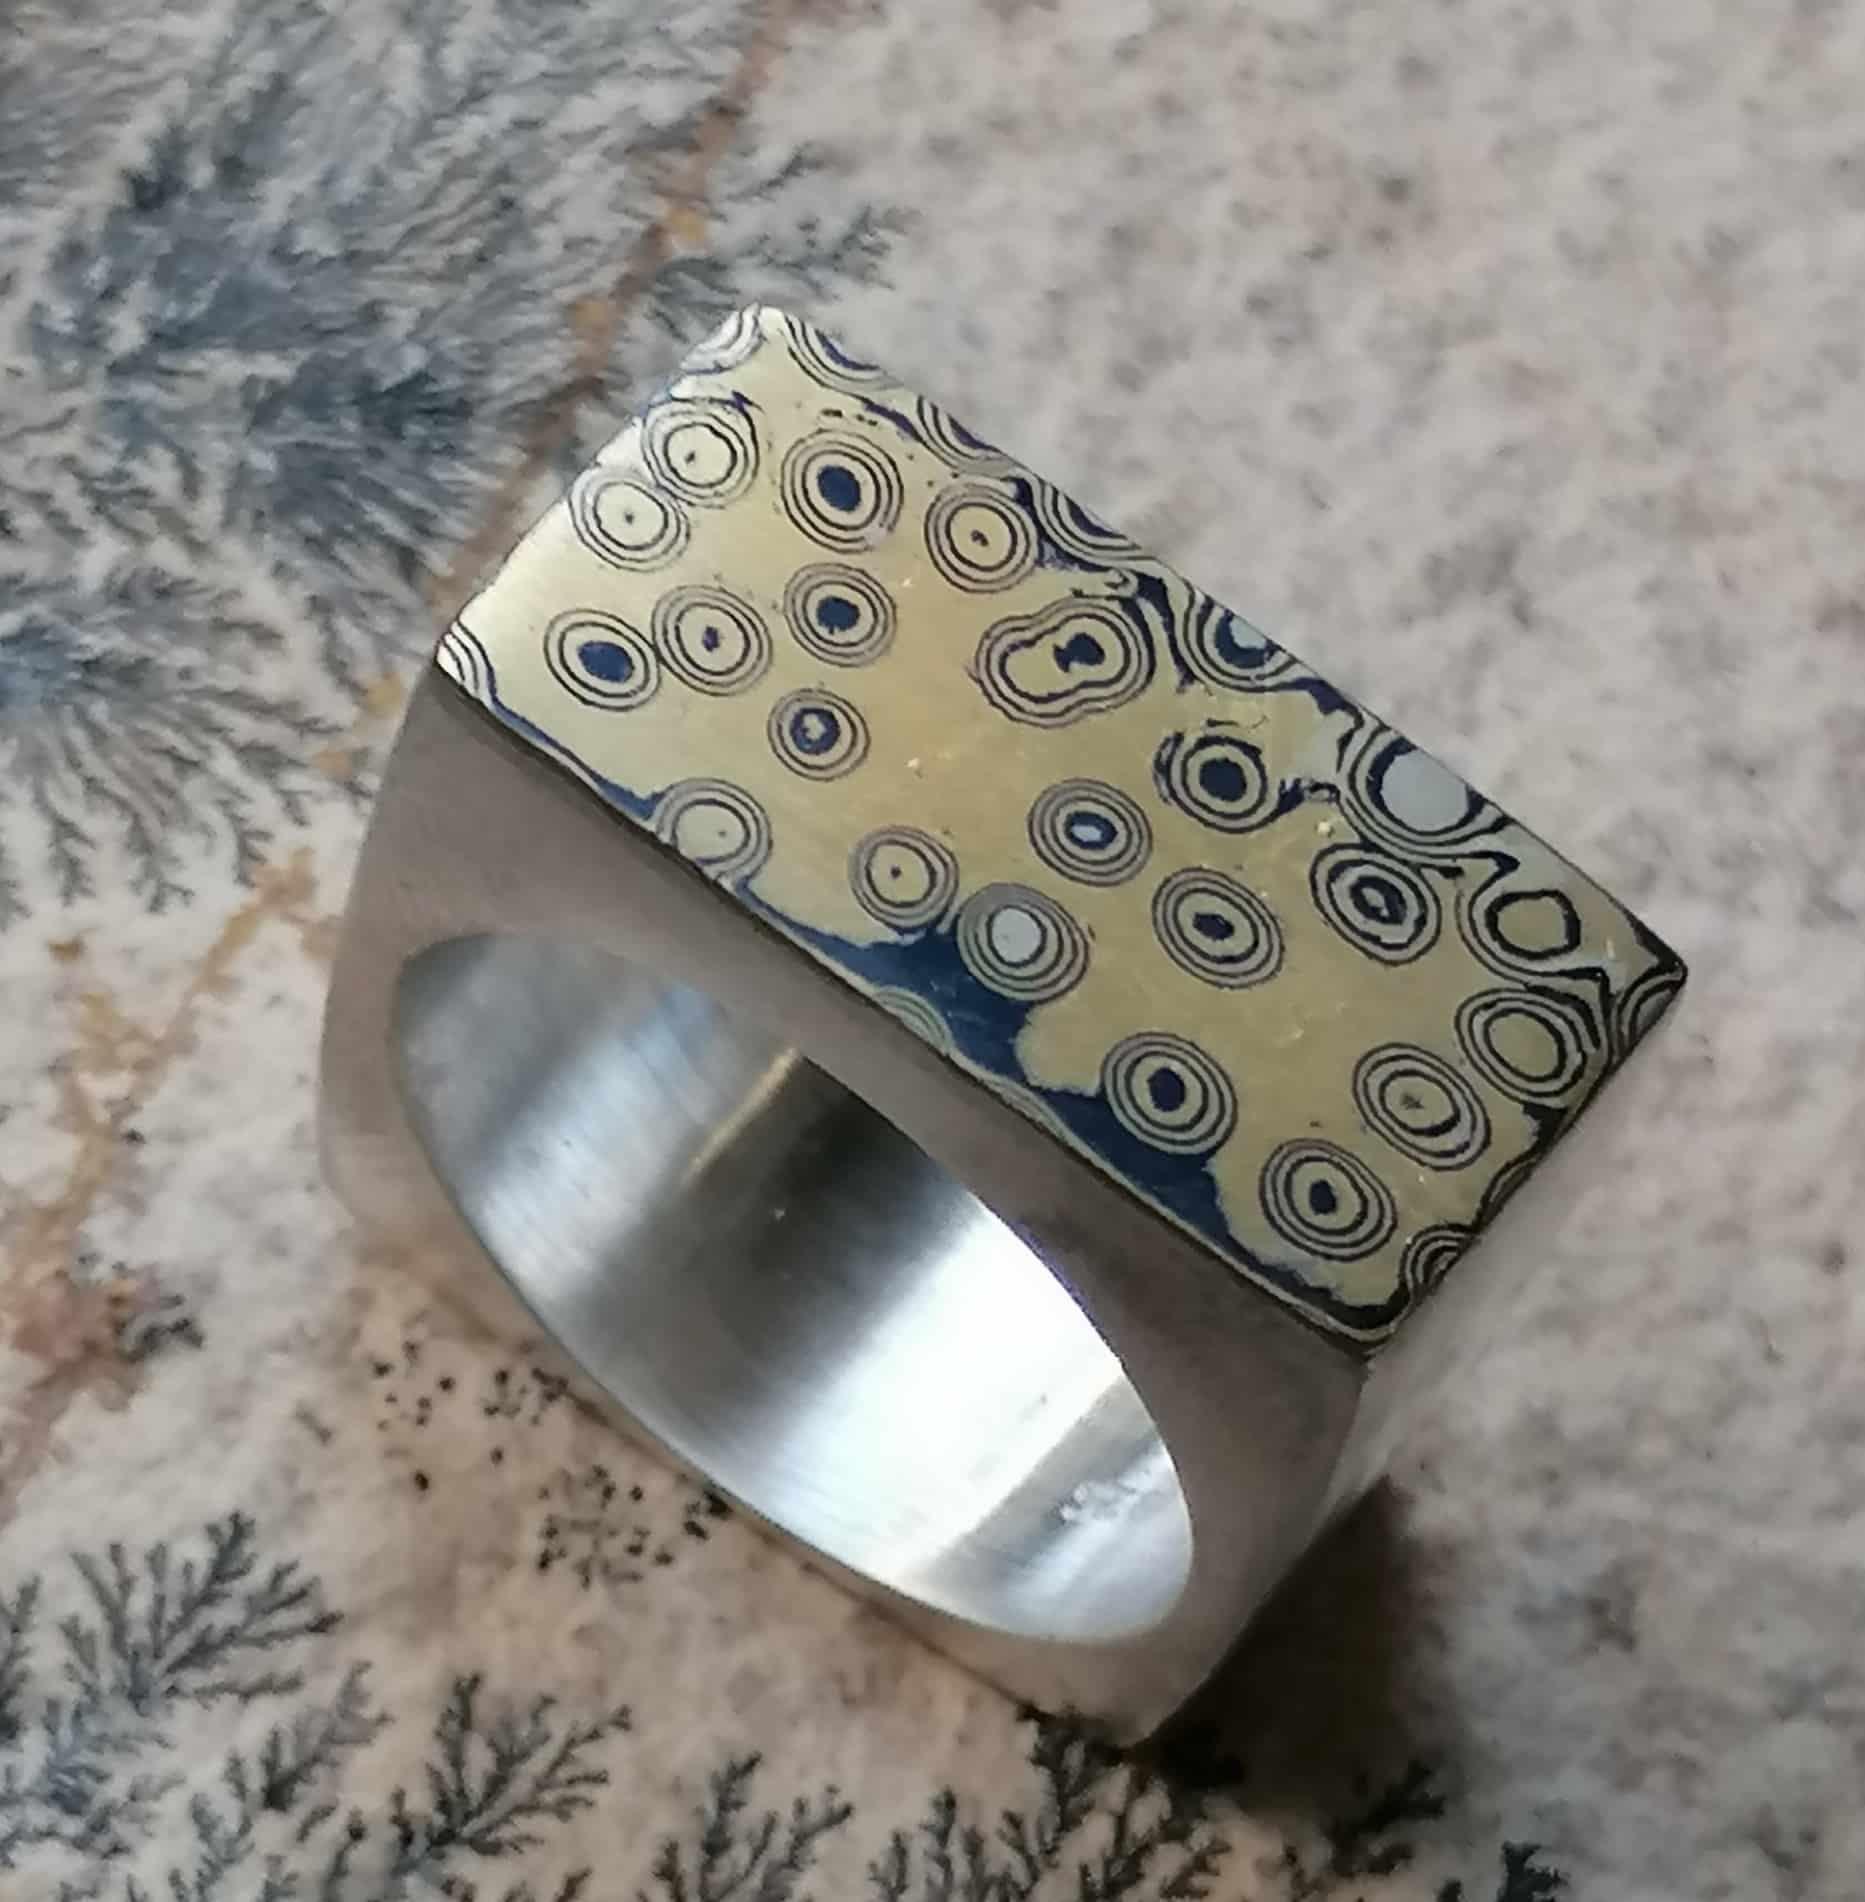 Unikat Ring Silber 925 mit Mokume Gane Wurzelholzmaserung Gold 900 Silber 925 Viereck Vierkant 58